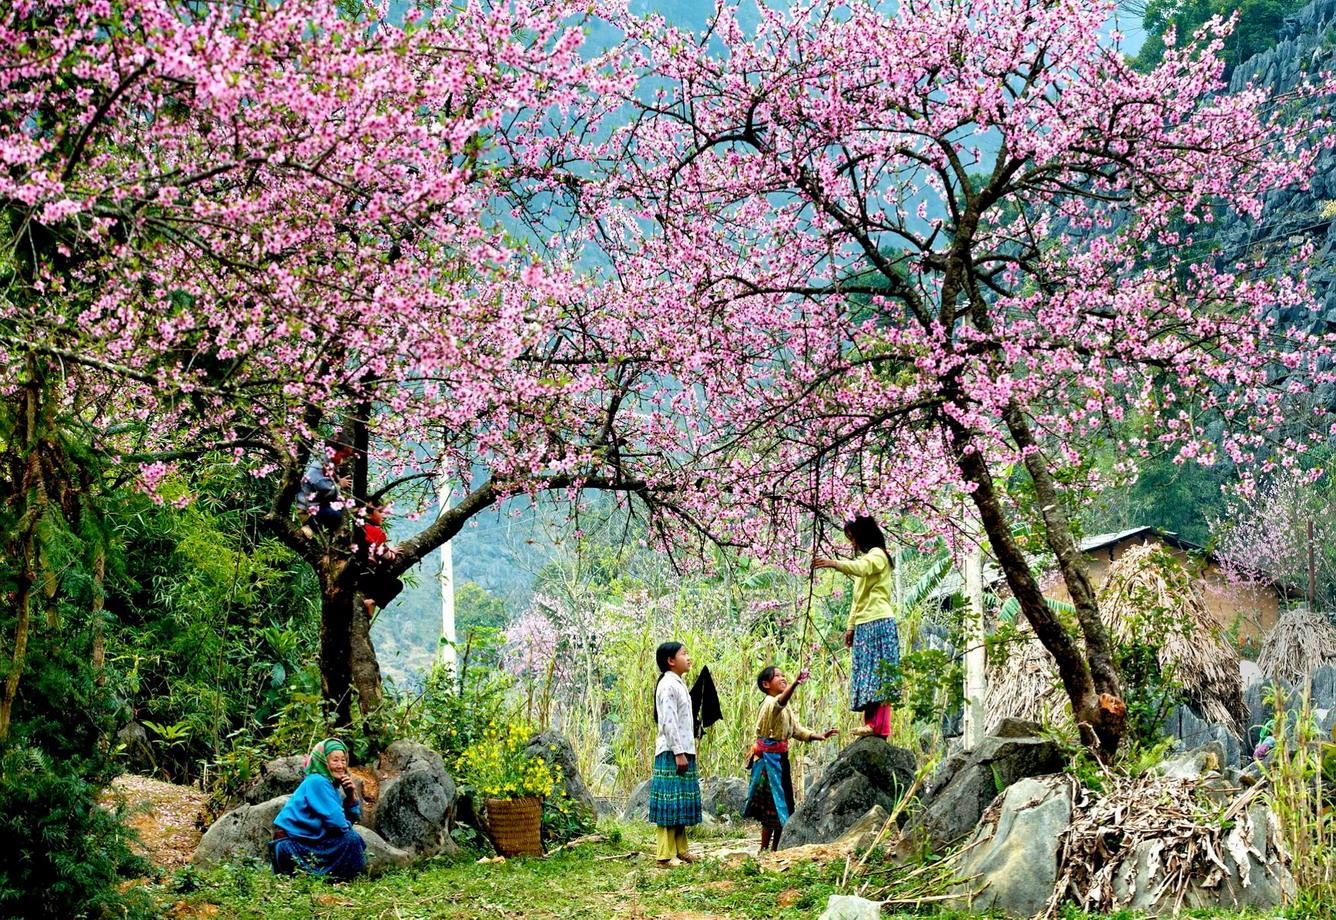 In spring, Sapa is full of beautiful flowers